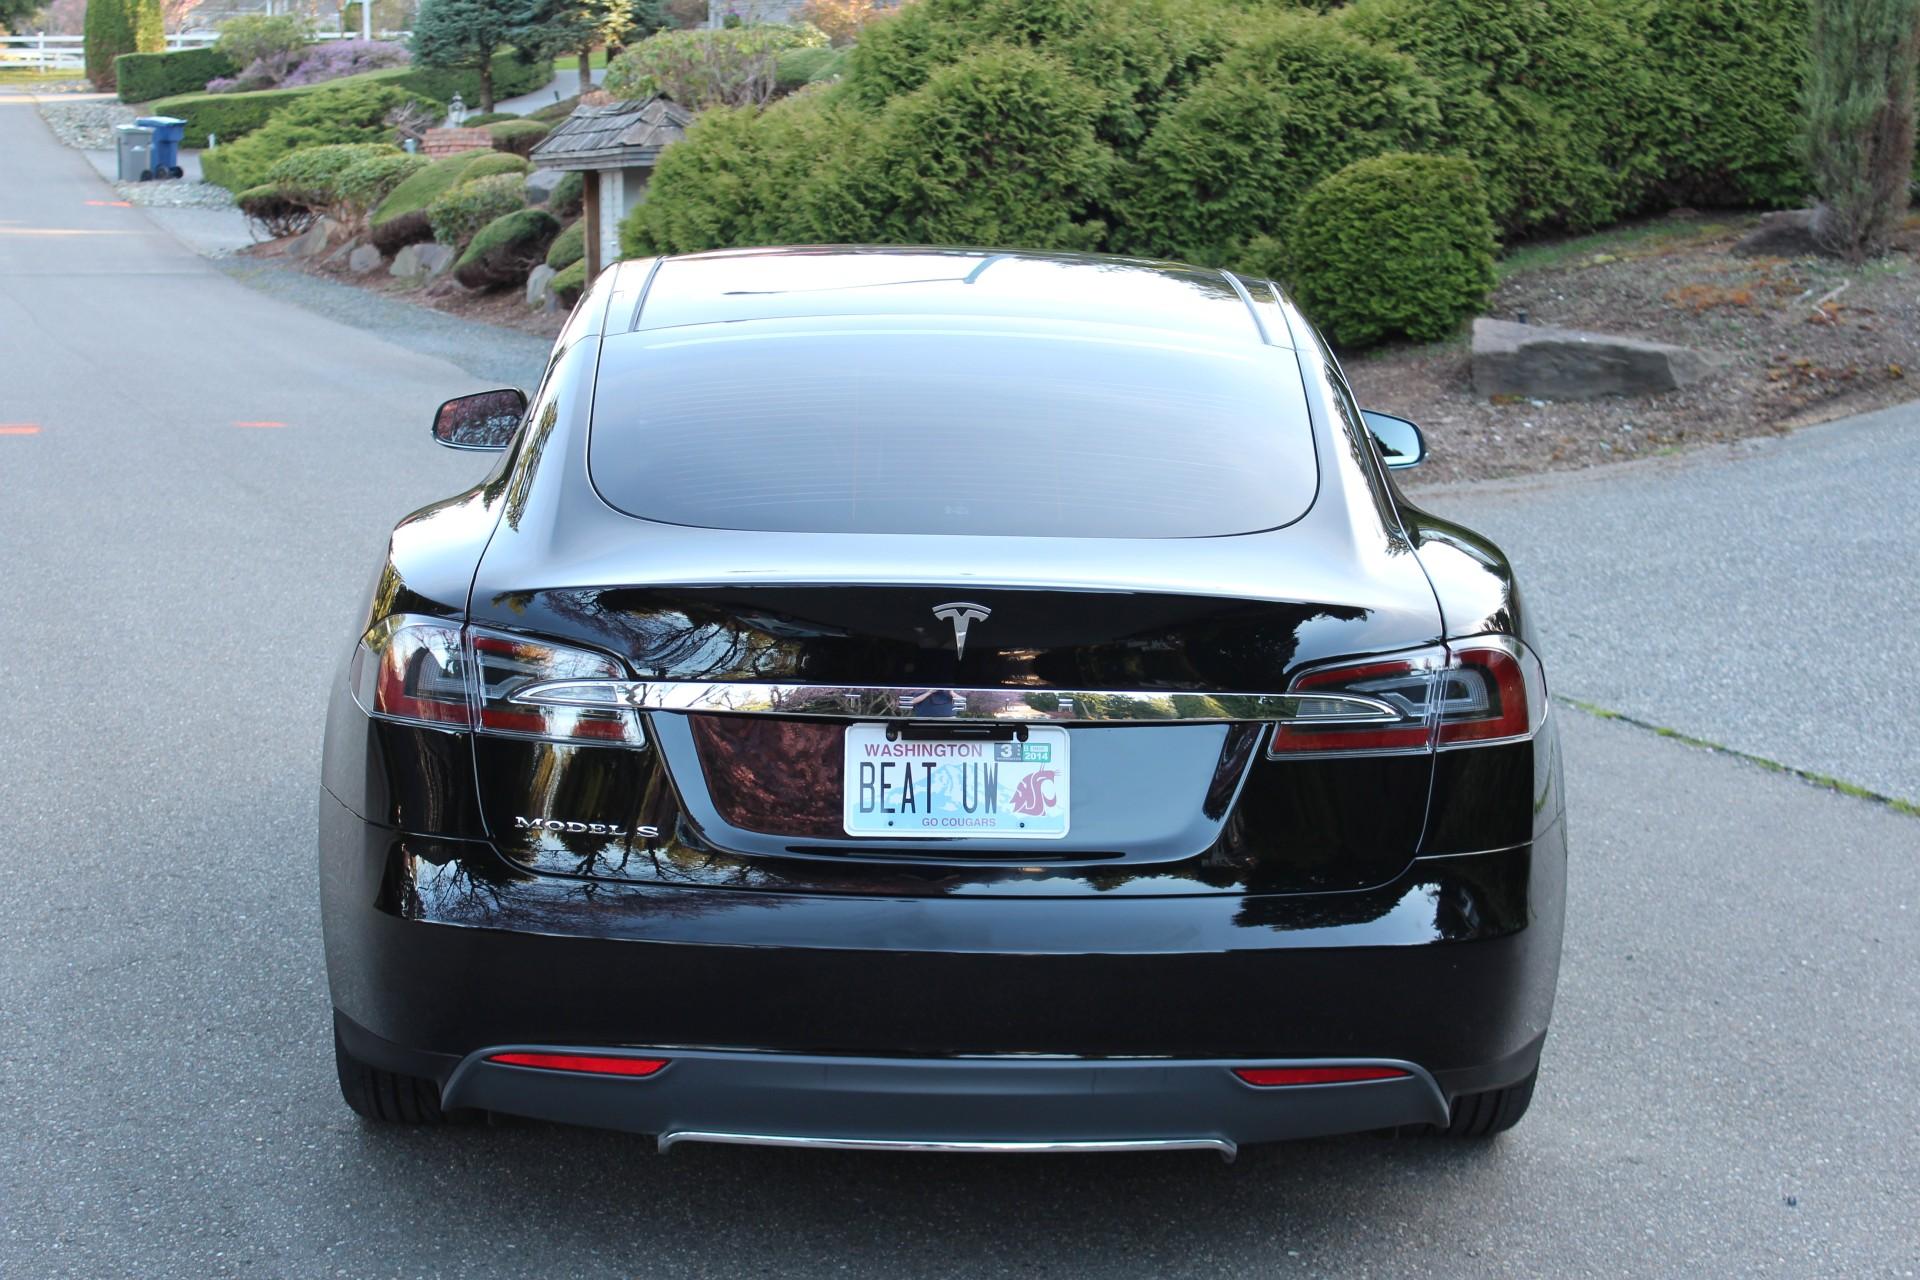 Teslatint3.jpg